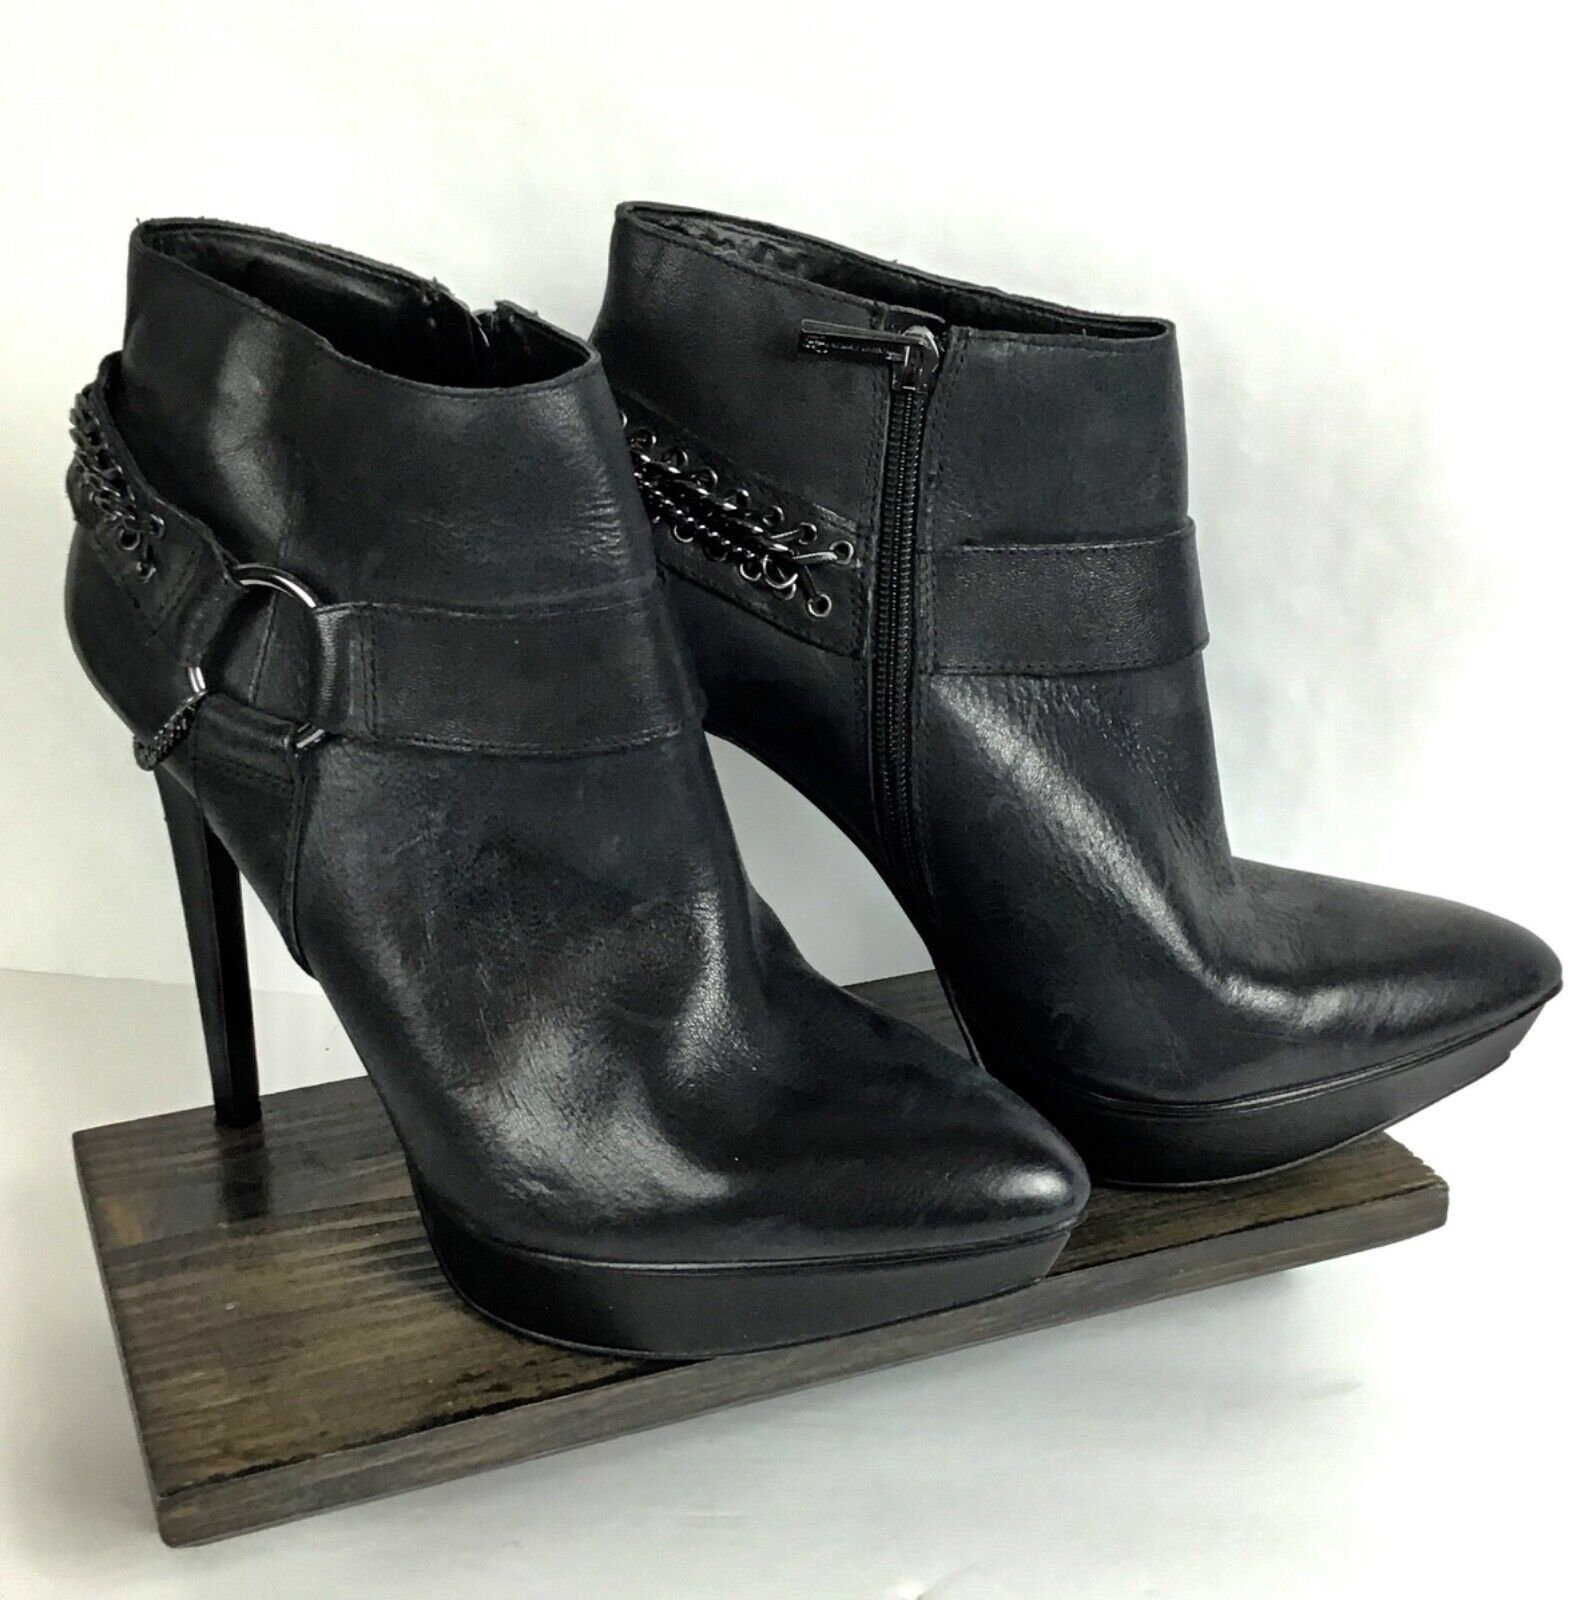 Jessica Simpson Vinata 10M Ankle Bootie Platform Stiletto Heels Chains Side Zip  image 9